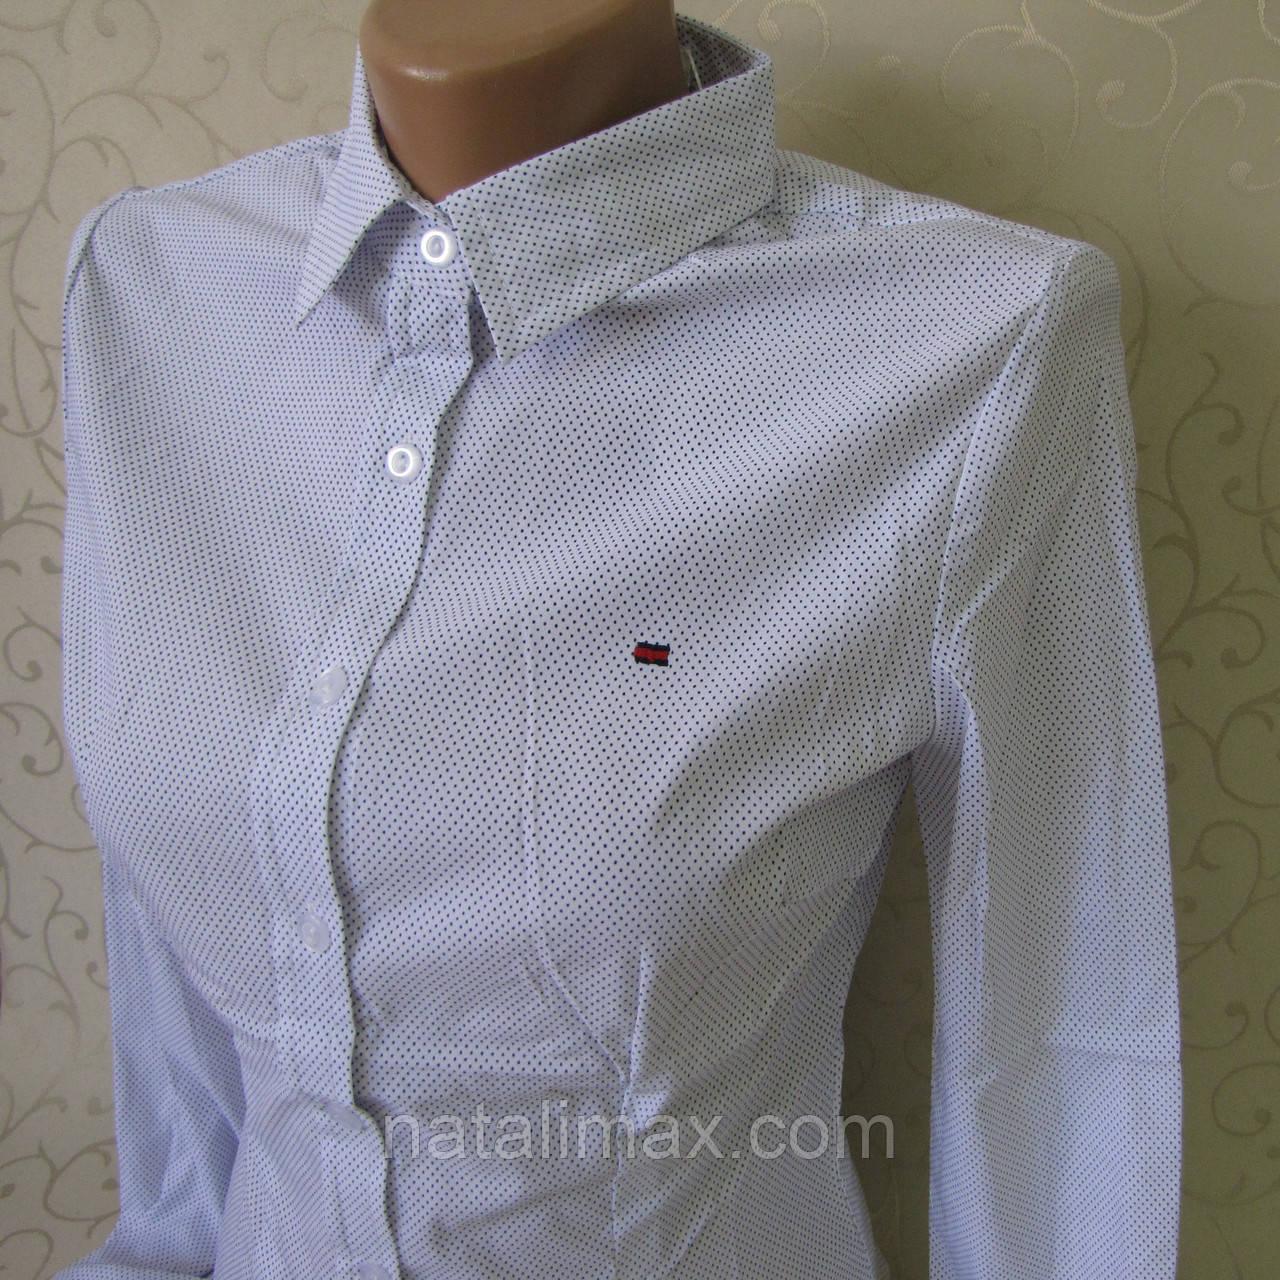 2e60c9d53f8 Блузка - рубашка для девушек